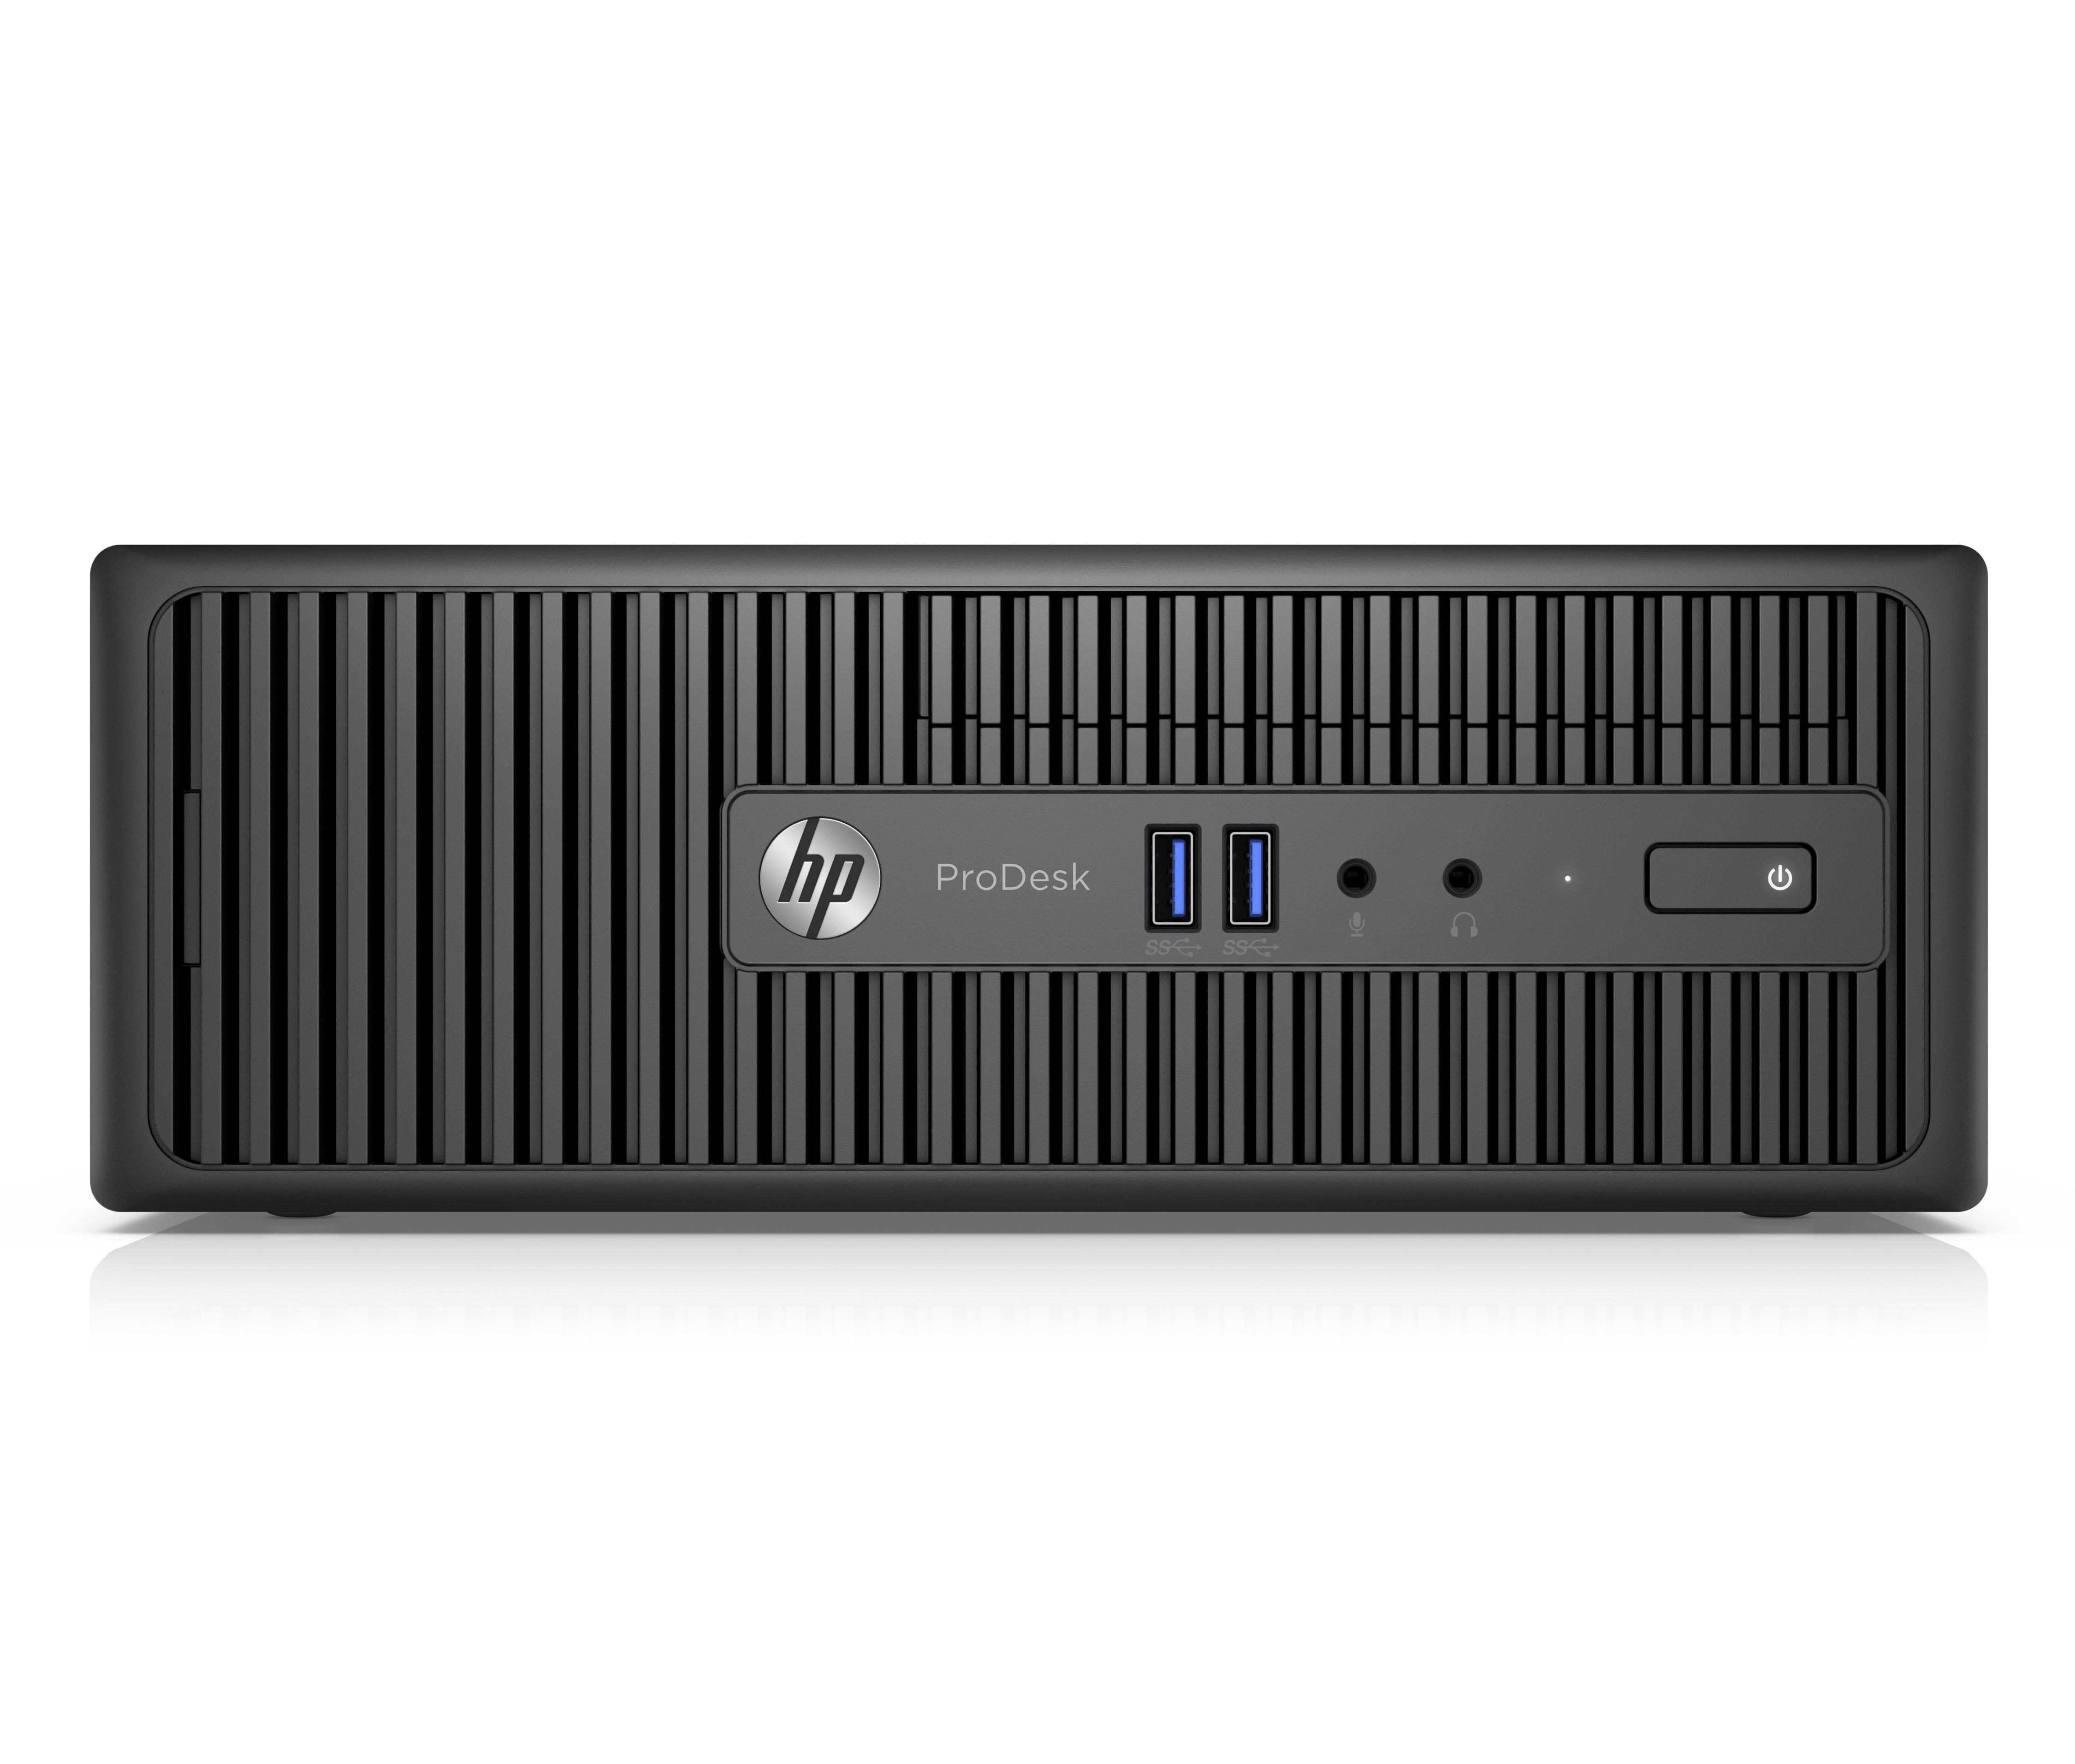 HP ProDesk 400 G3 SFF 3.7GHz i3-6100 SFF Black